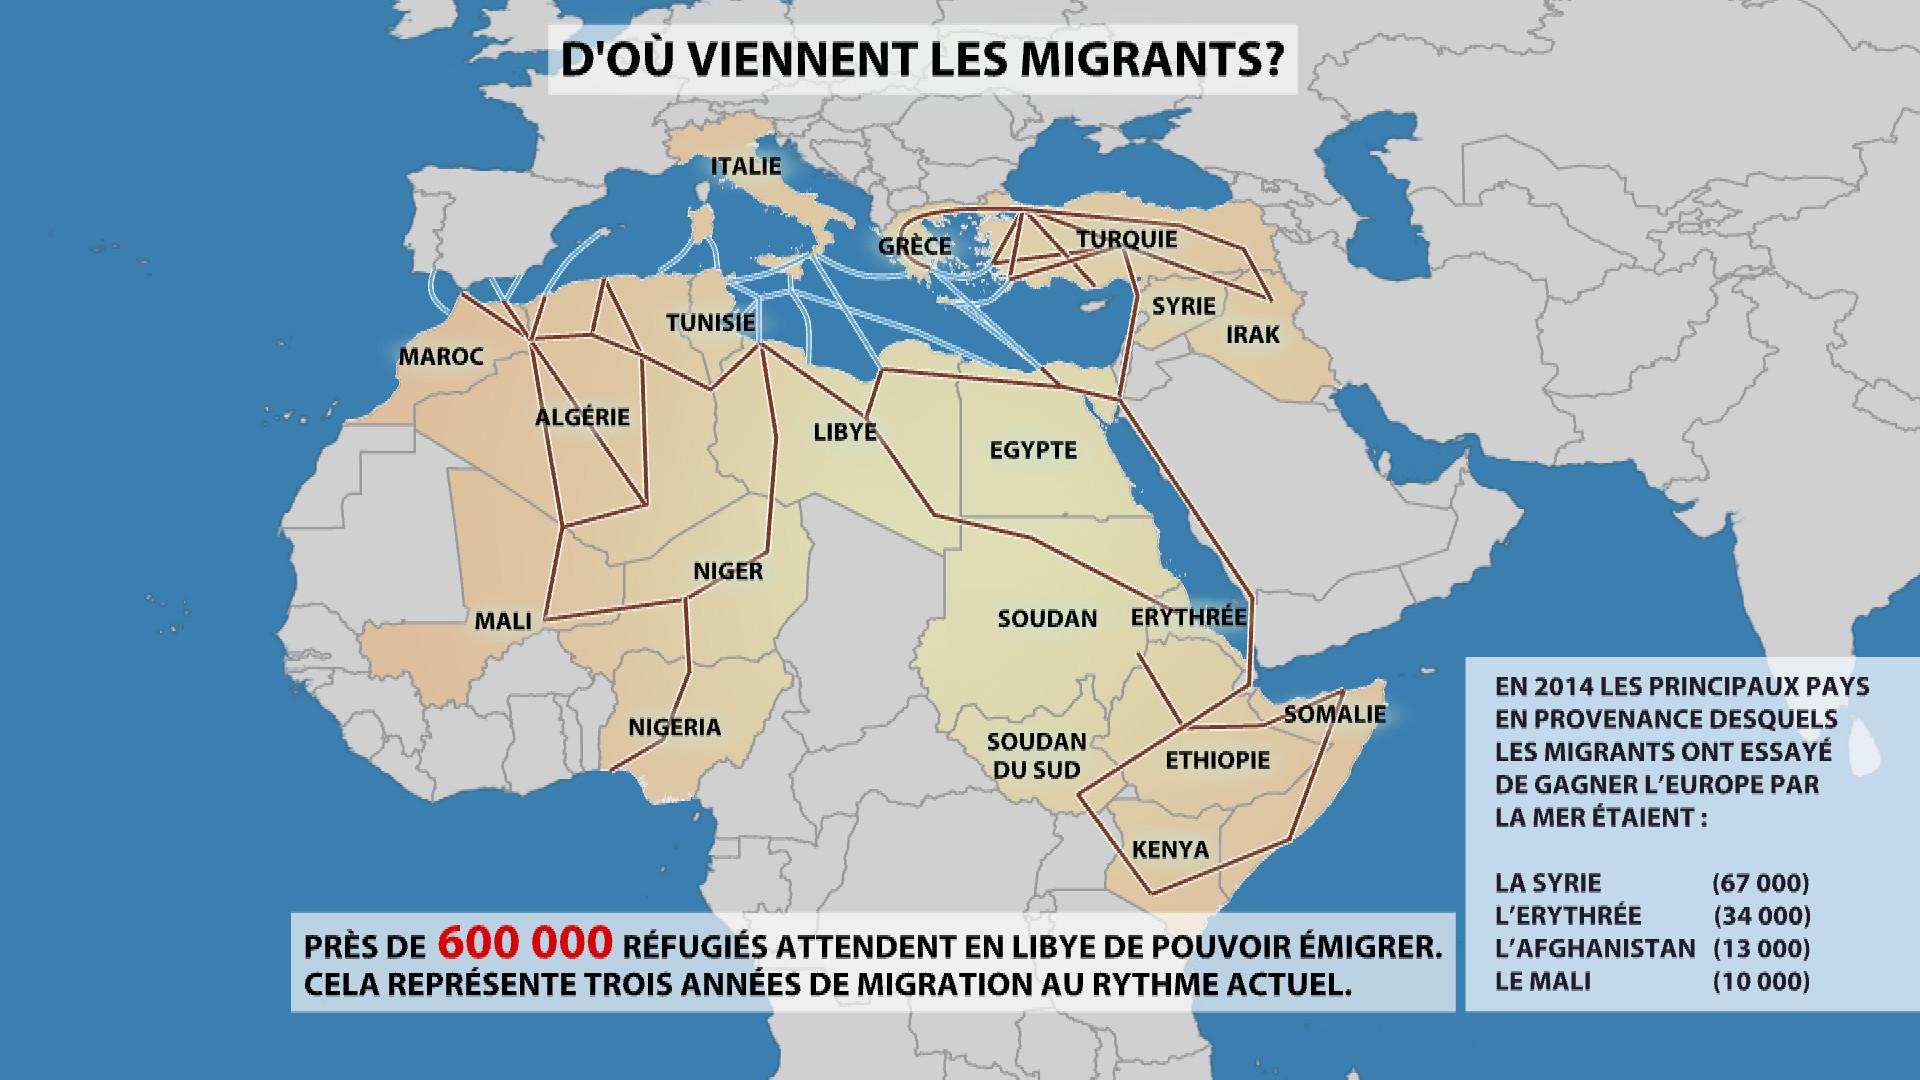 D'où viennent les migrants?